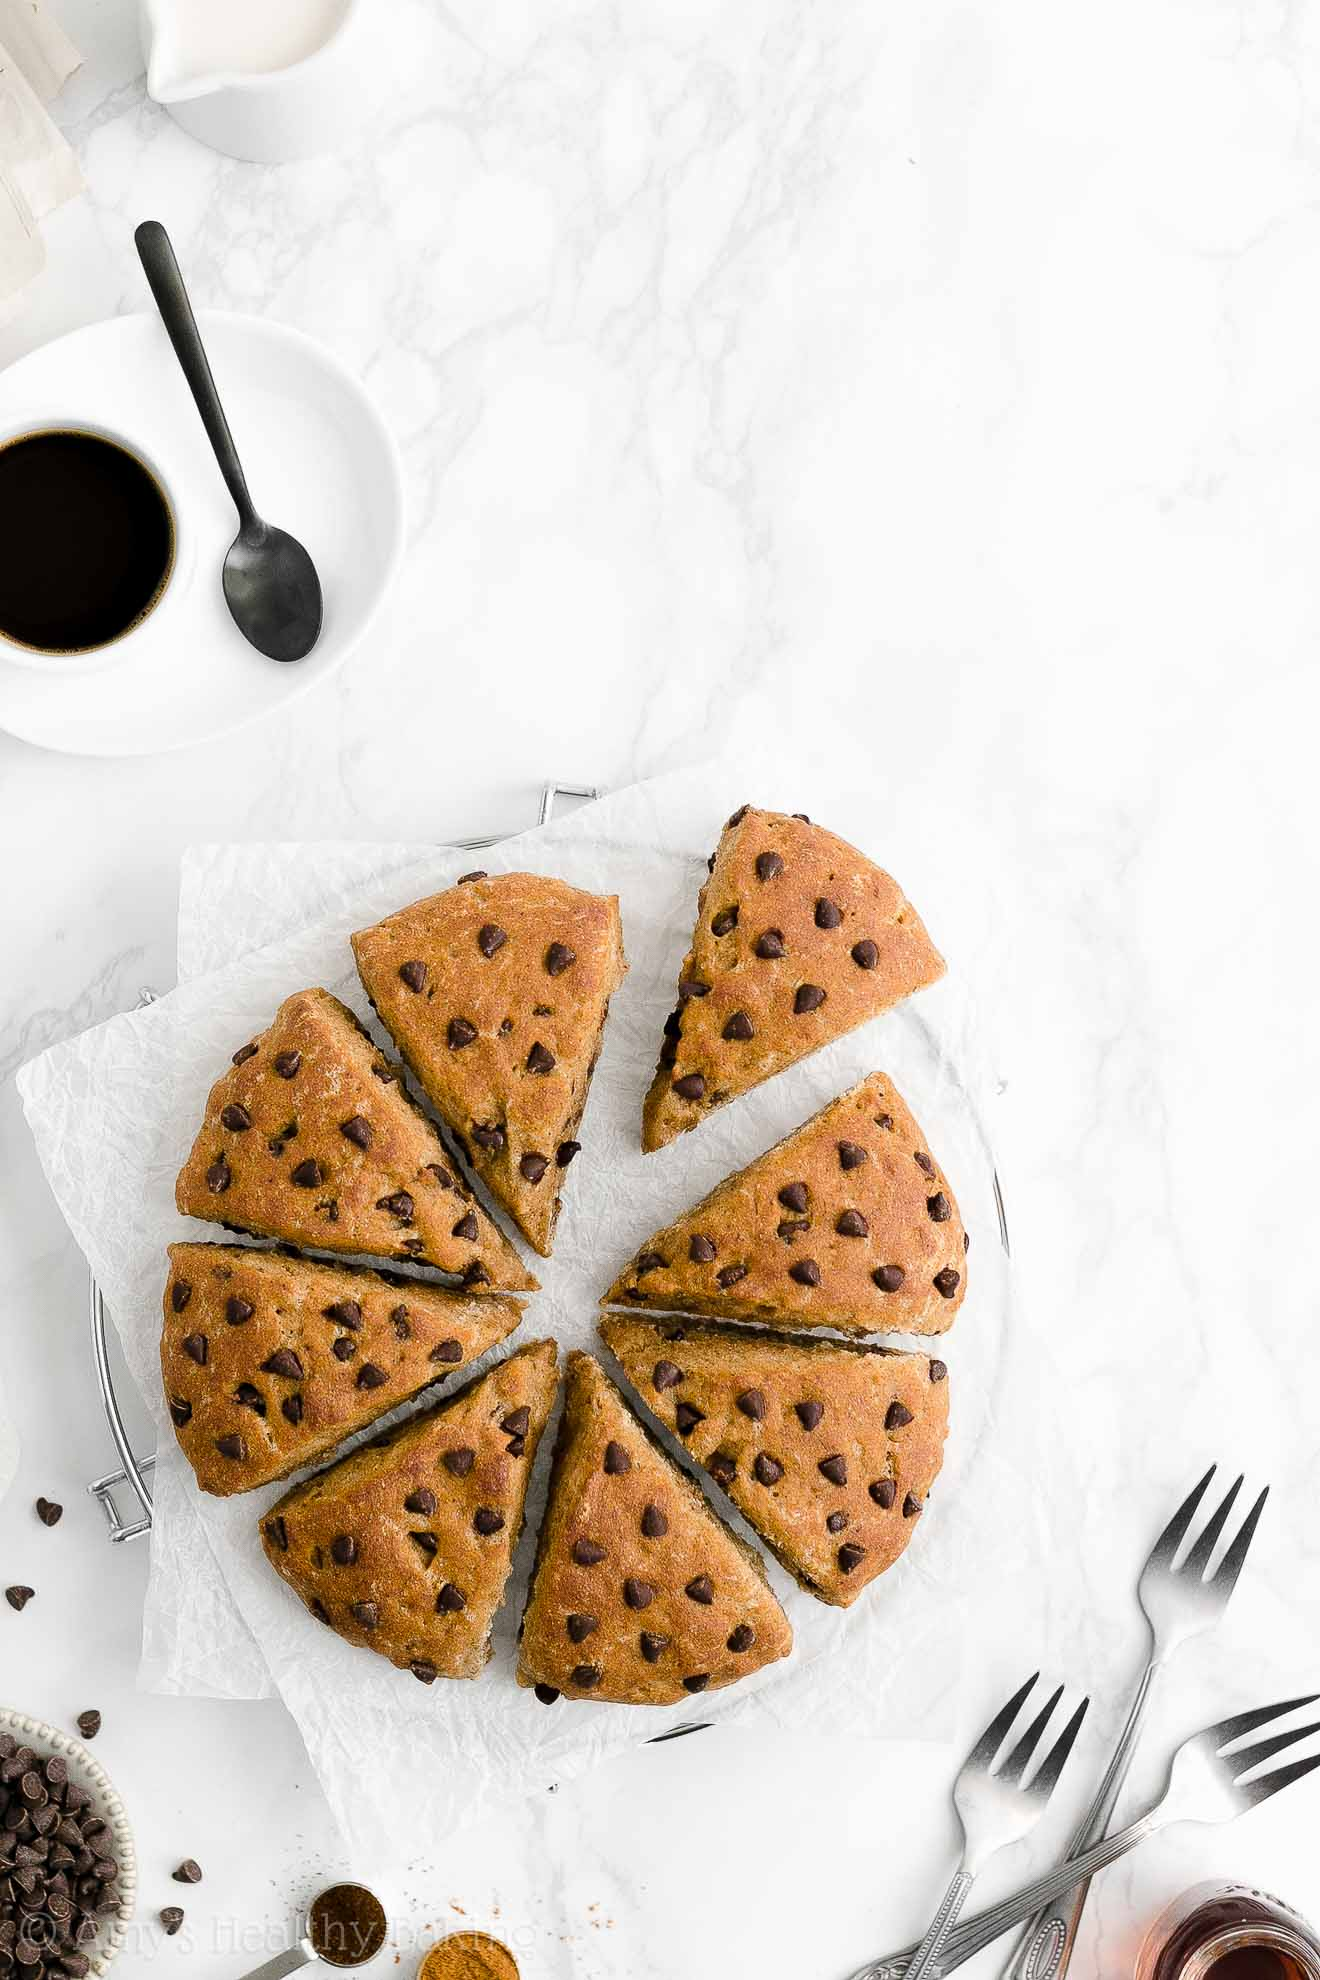 Easy Healthy Low Fat Gluten Free Vegan Moist Chai Spice Chocolate Chip Scones